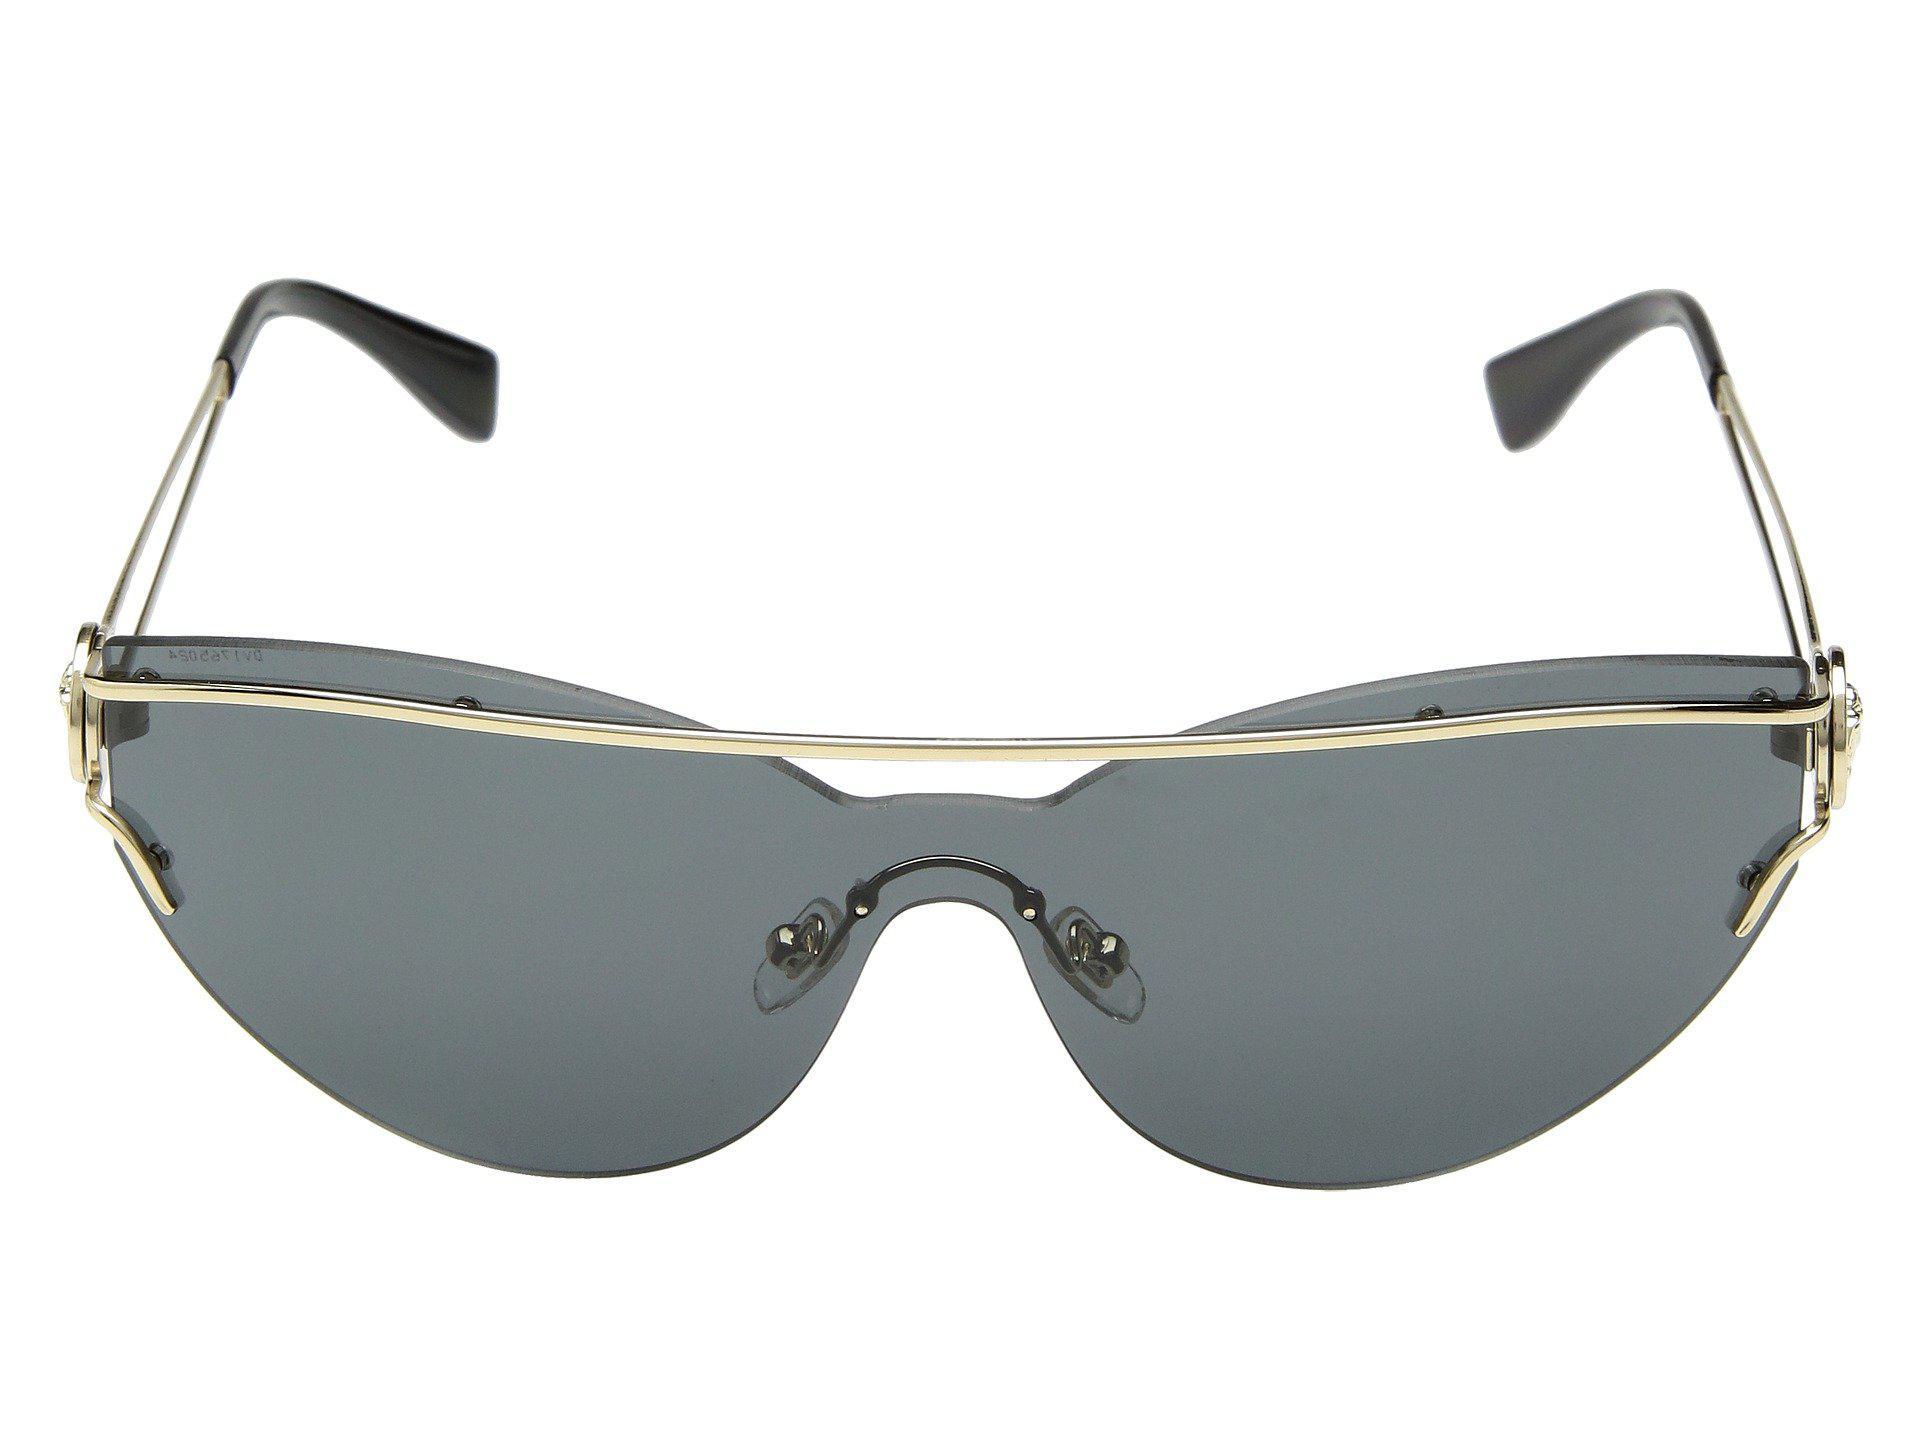 868c3e882579 Lyst - Versace Ve2186 (pale Gold grey) Fashion Sunglasses in Gray